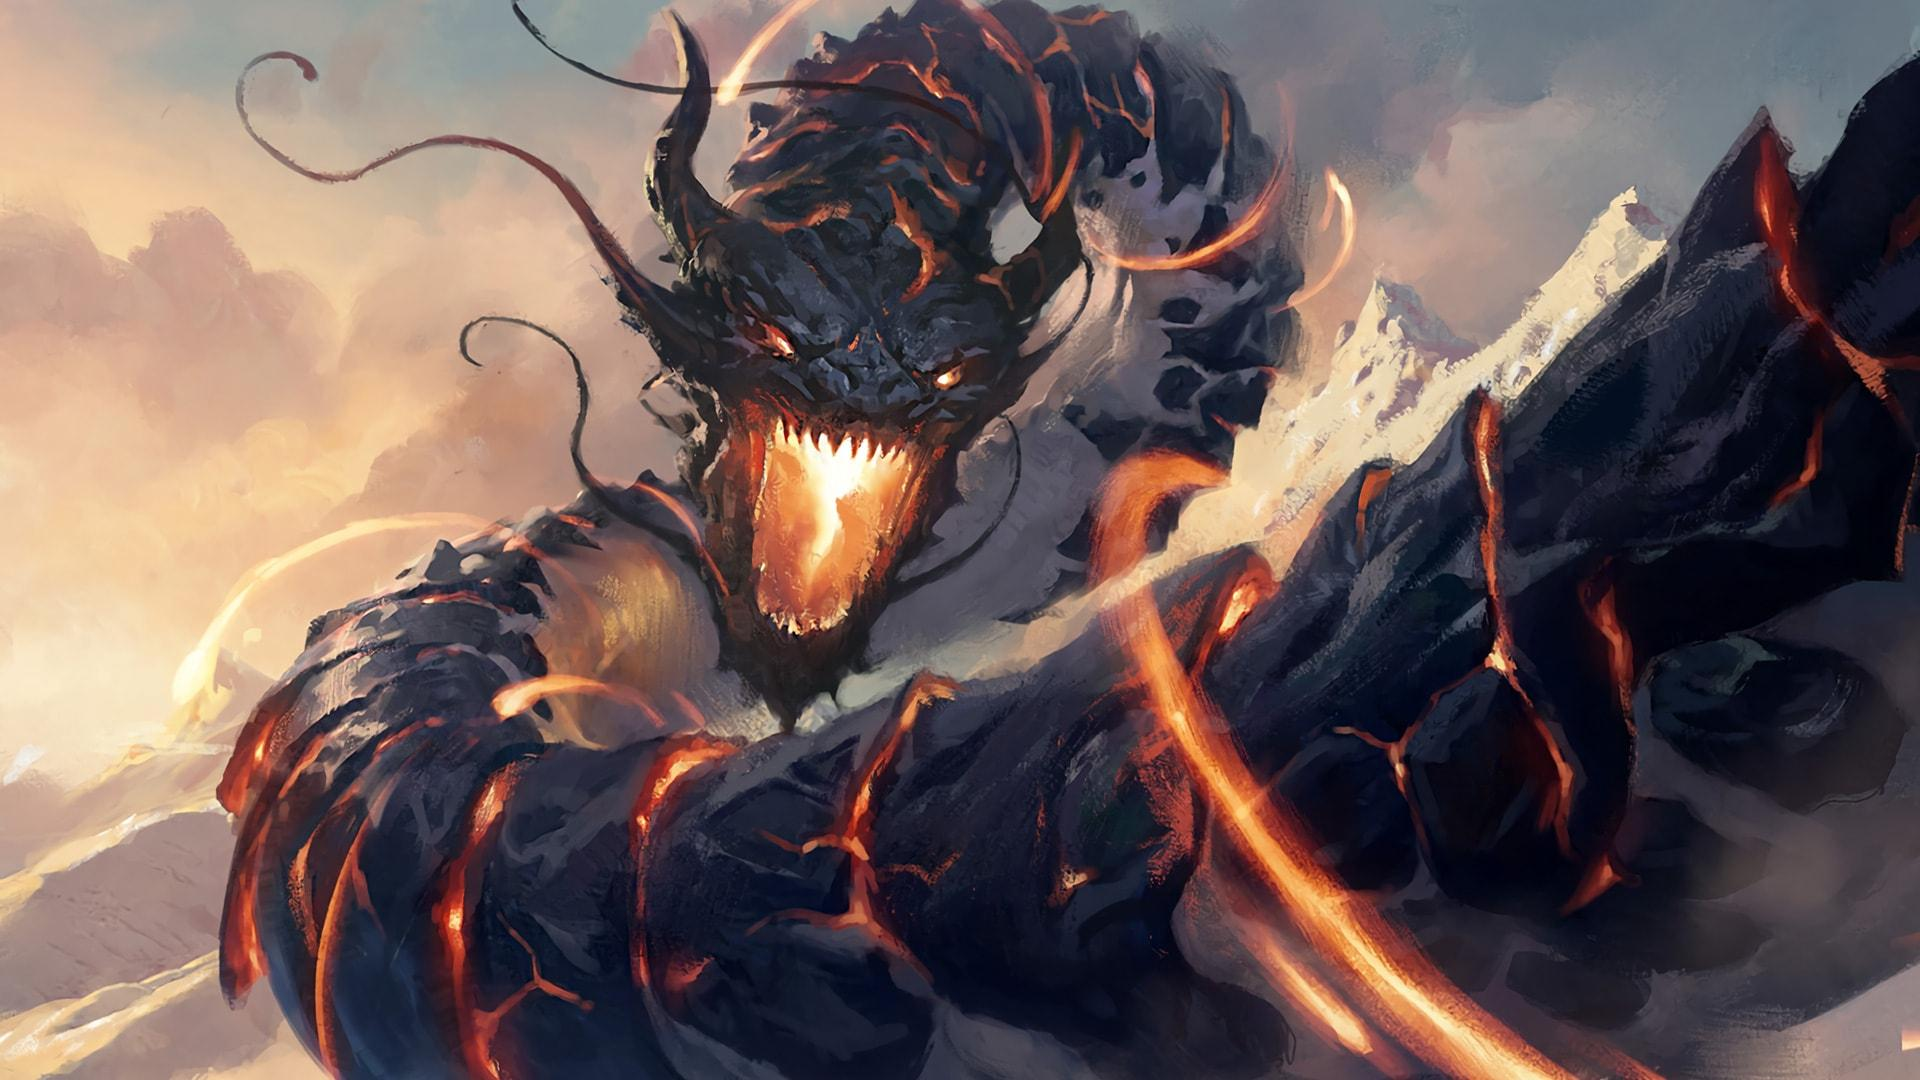 Dragon Fantasy Art Wallpapers Wallpaper Cave